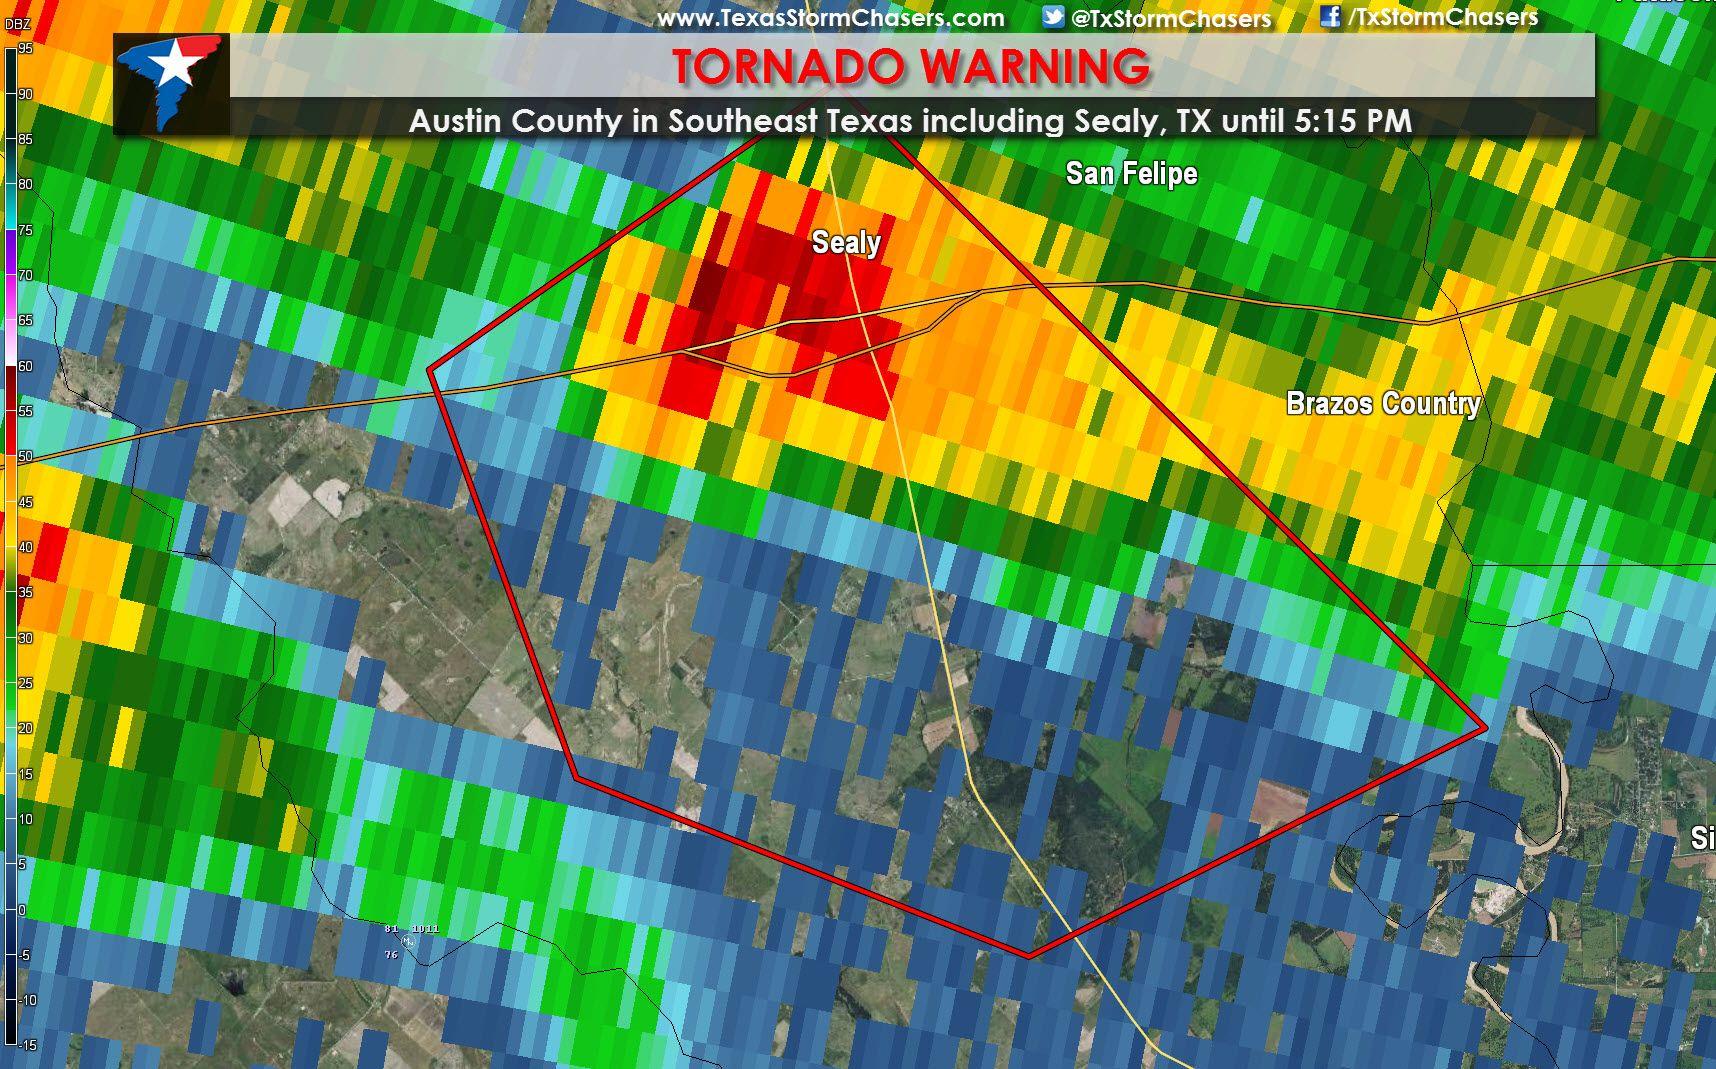 Tornado Warning For Sealy Tx Until 5 15 Pm Texas Storm Chasers Texas Storm Tornado Warning Tornado